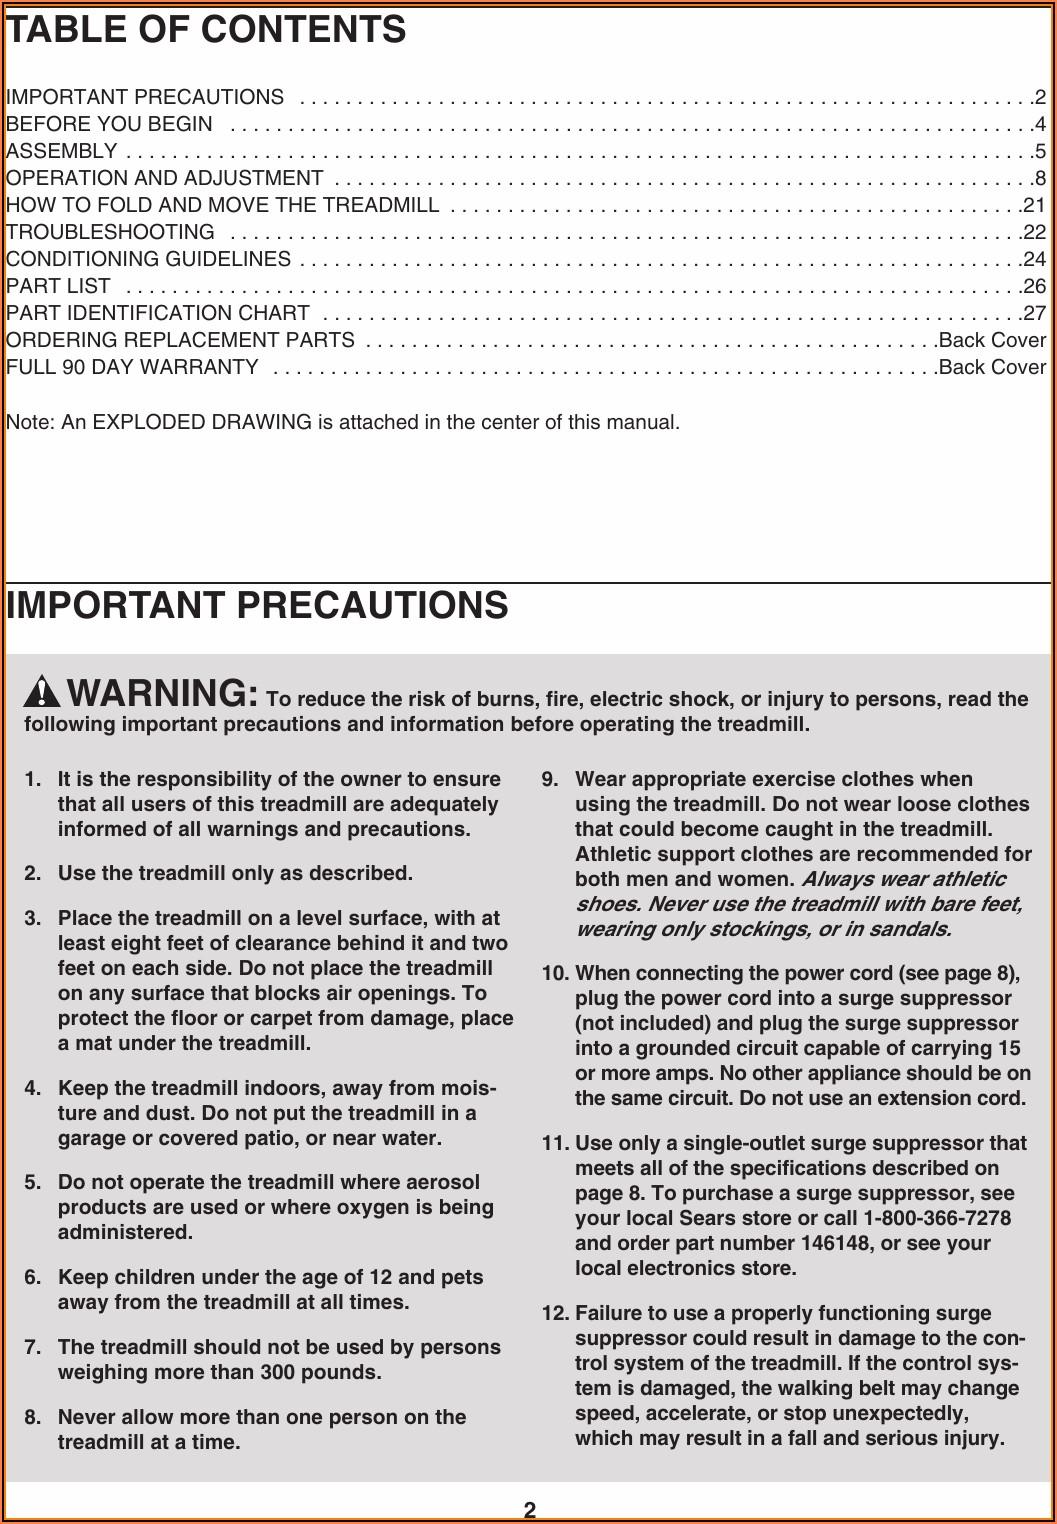 Proform Xp 542e Treadmill Manual